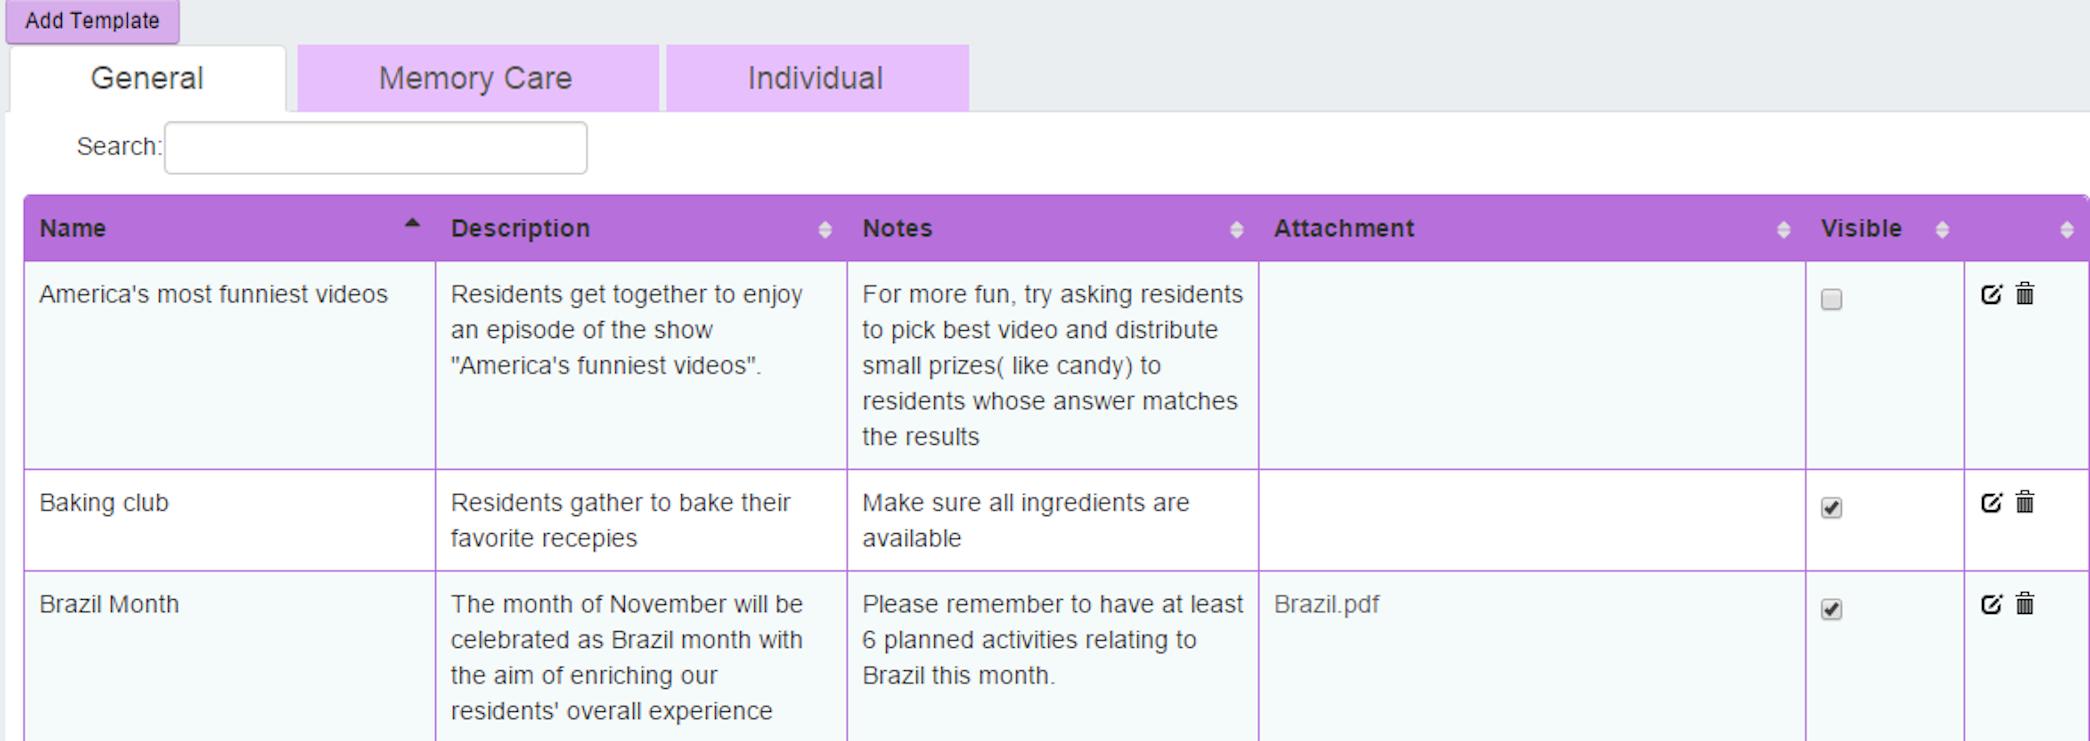 Activity templates